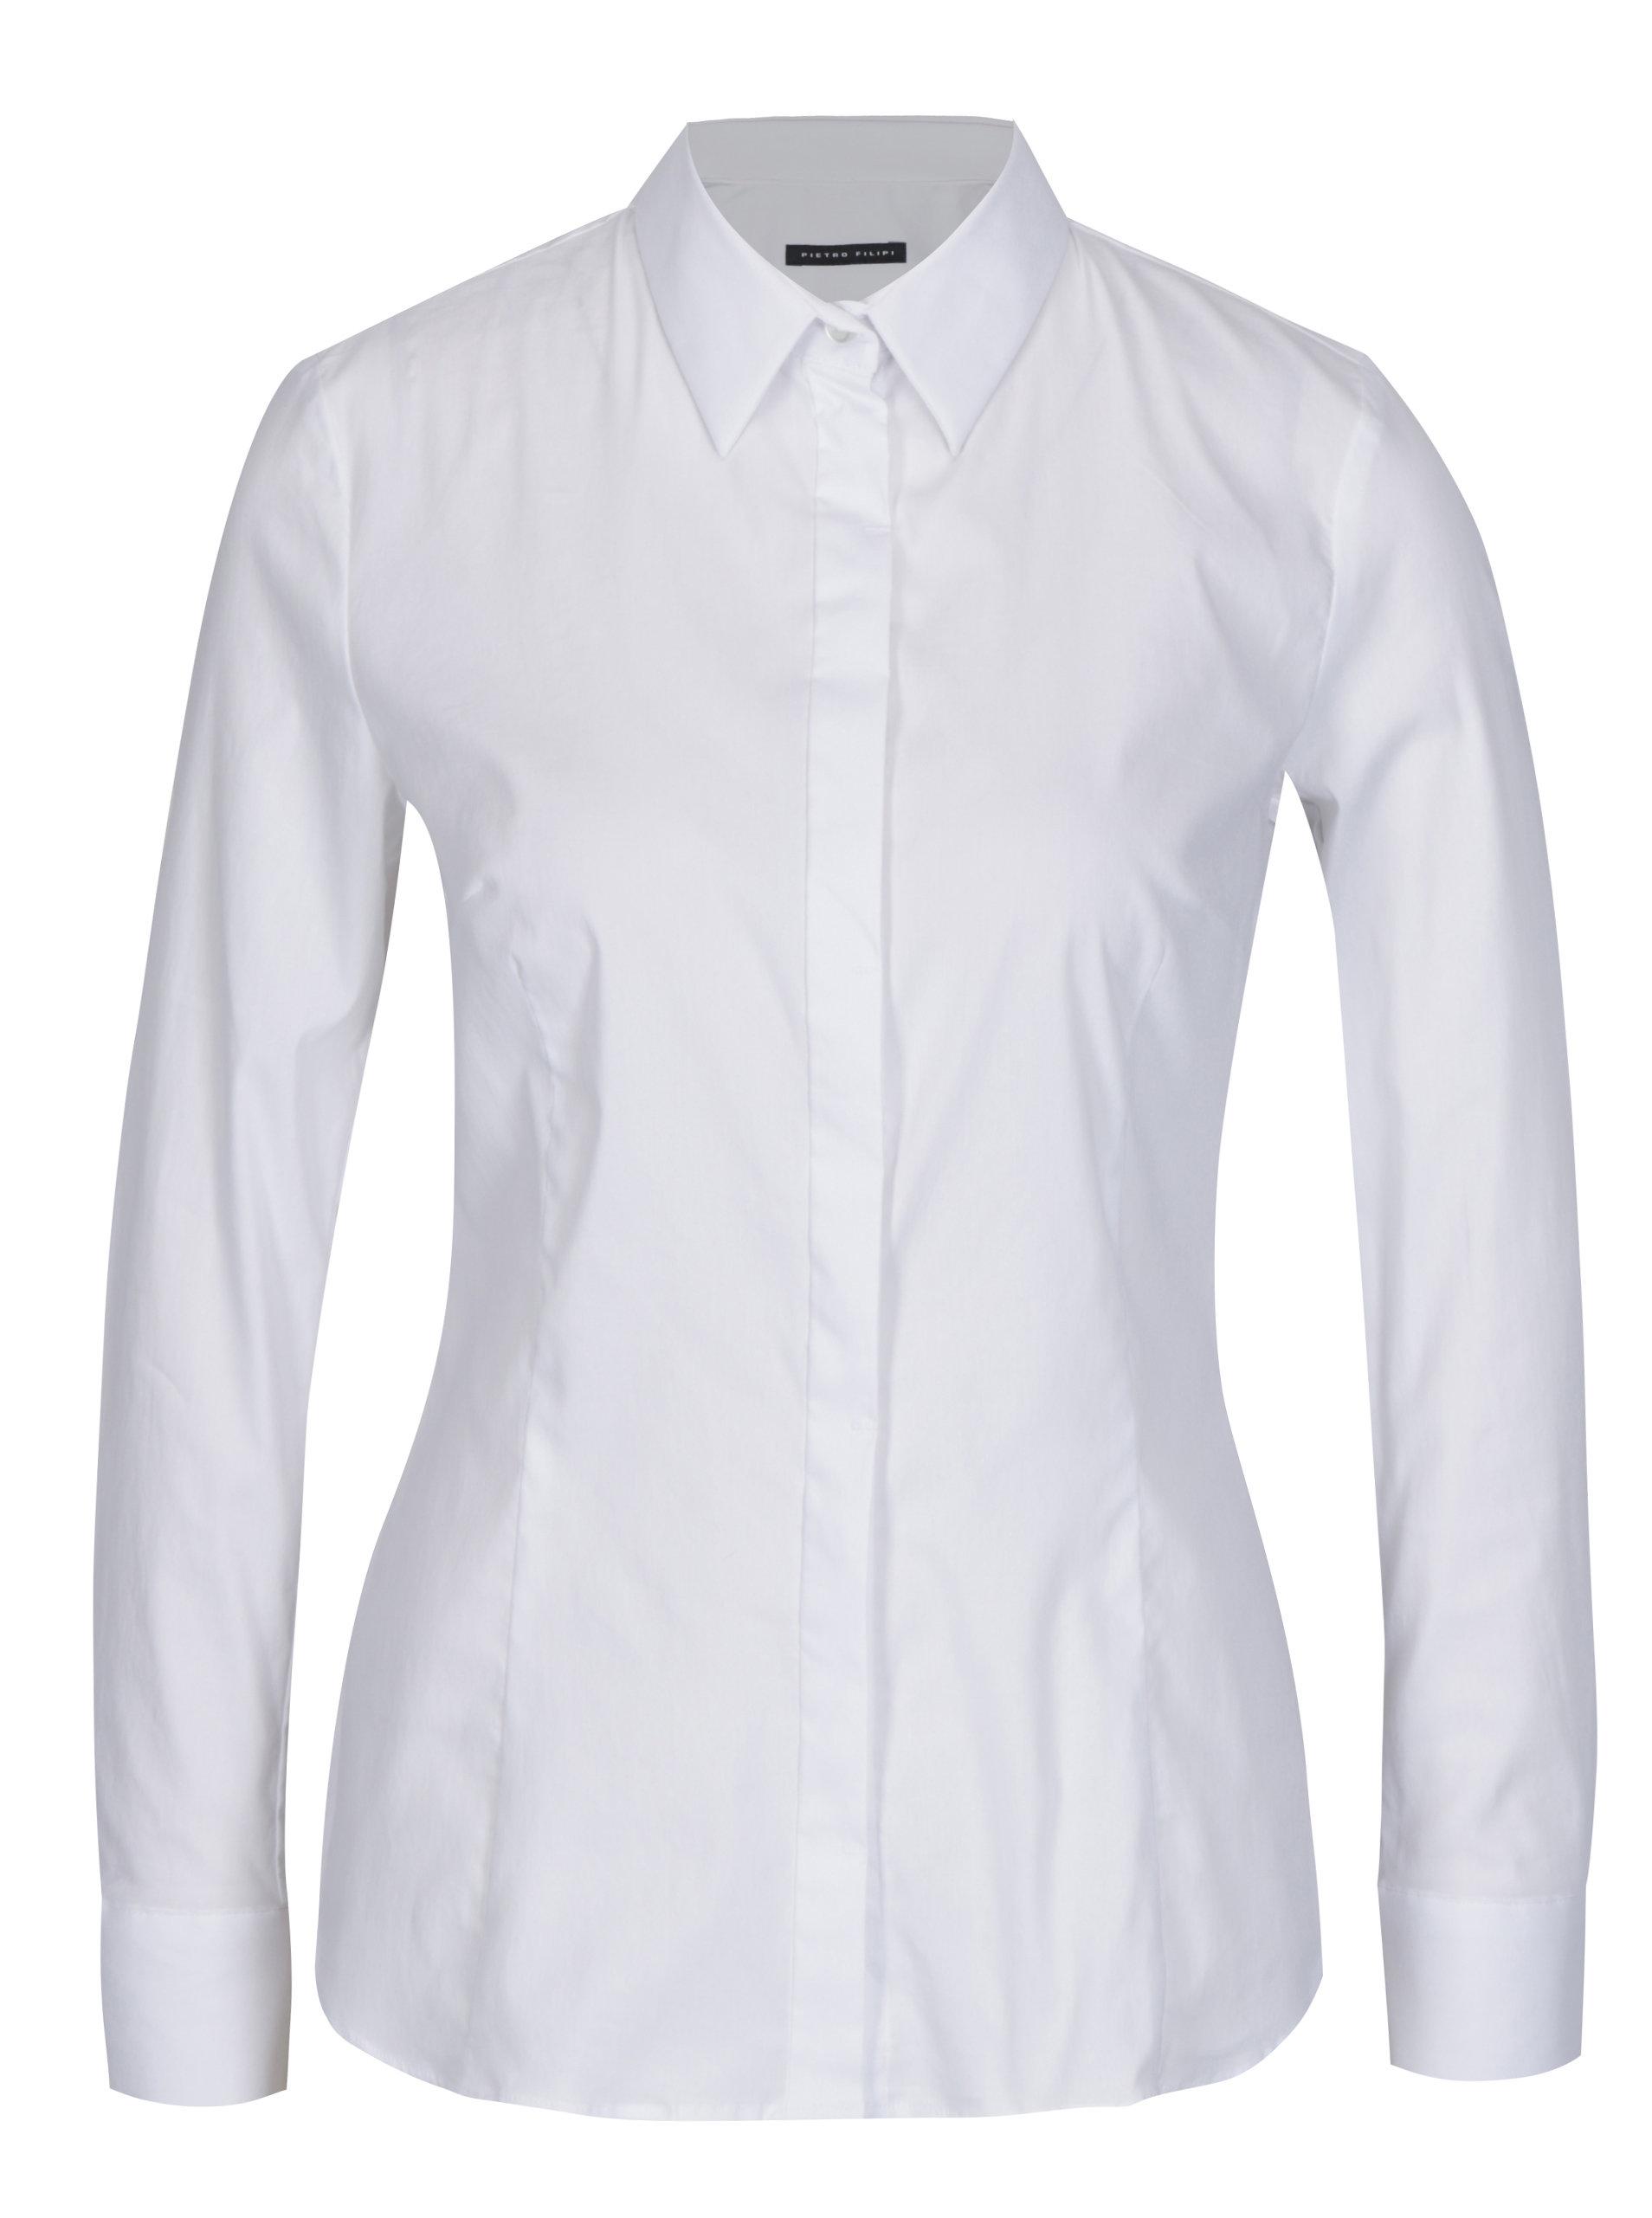 d1aefc5a1fde Biela dámska košeľa Pietro Filipi ...